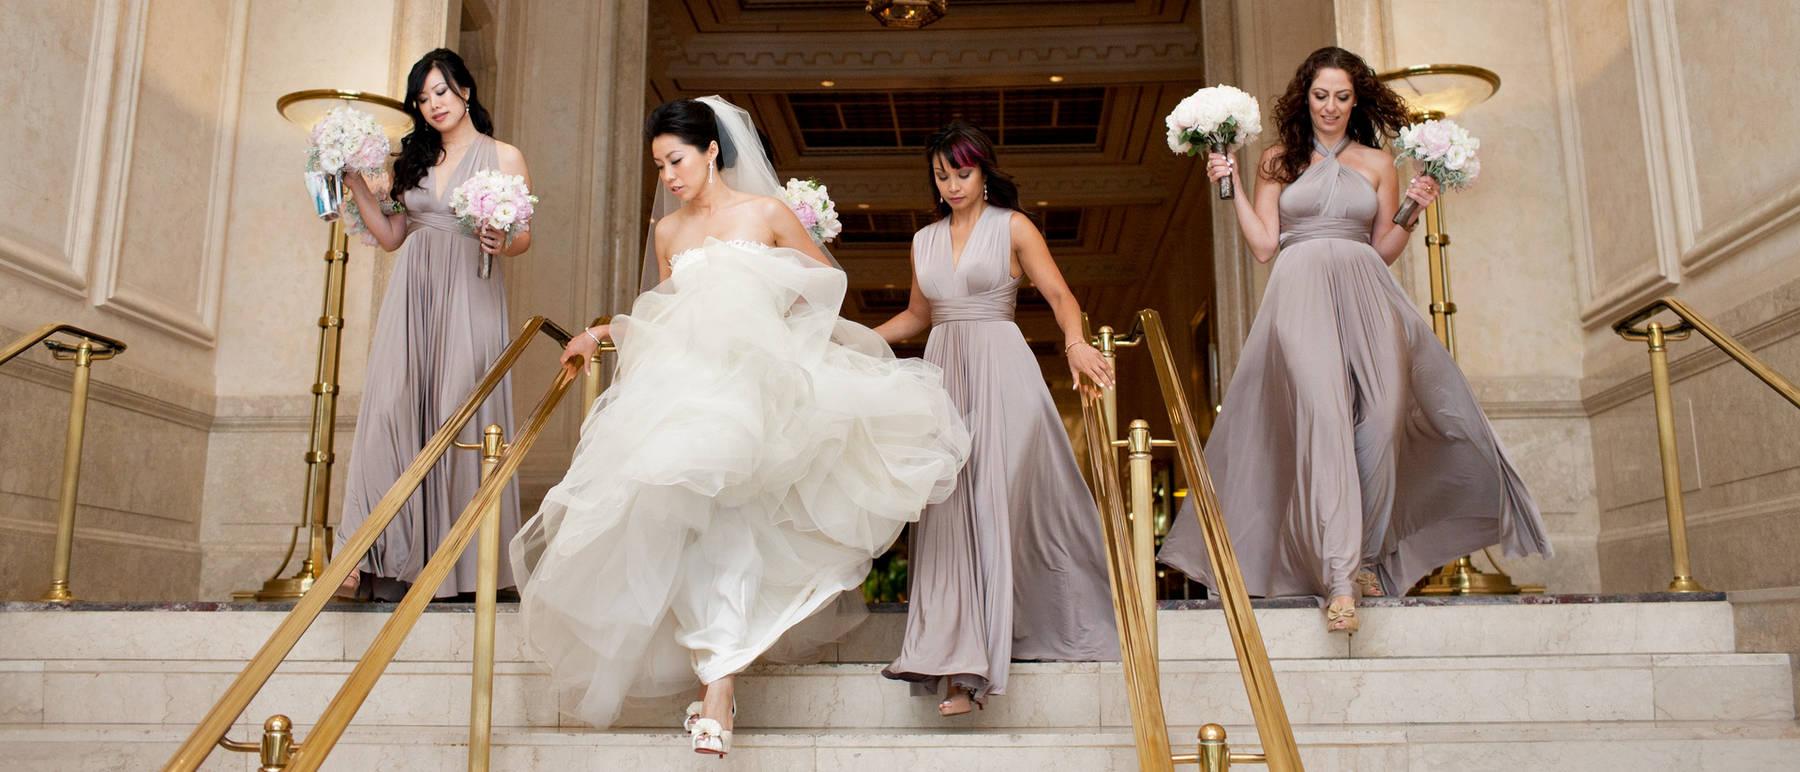 johnandjoseph-wedding-photographer-hz-slider-154